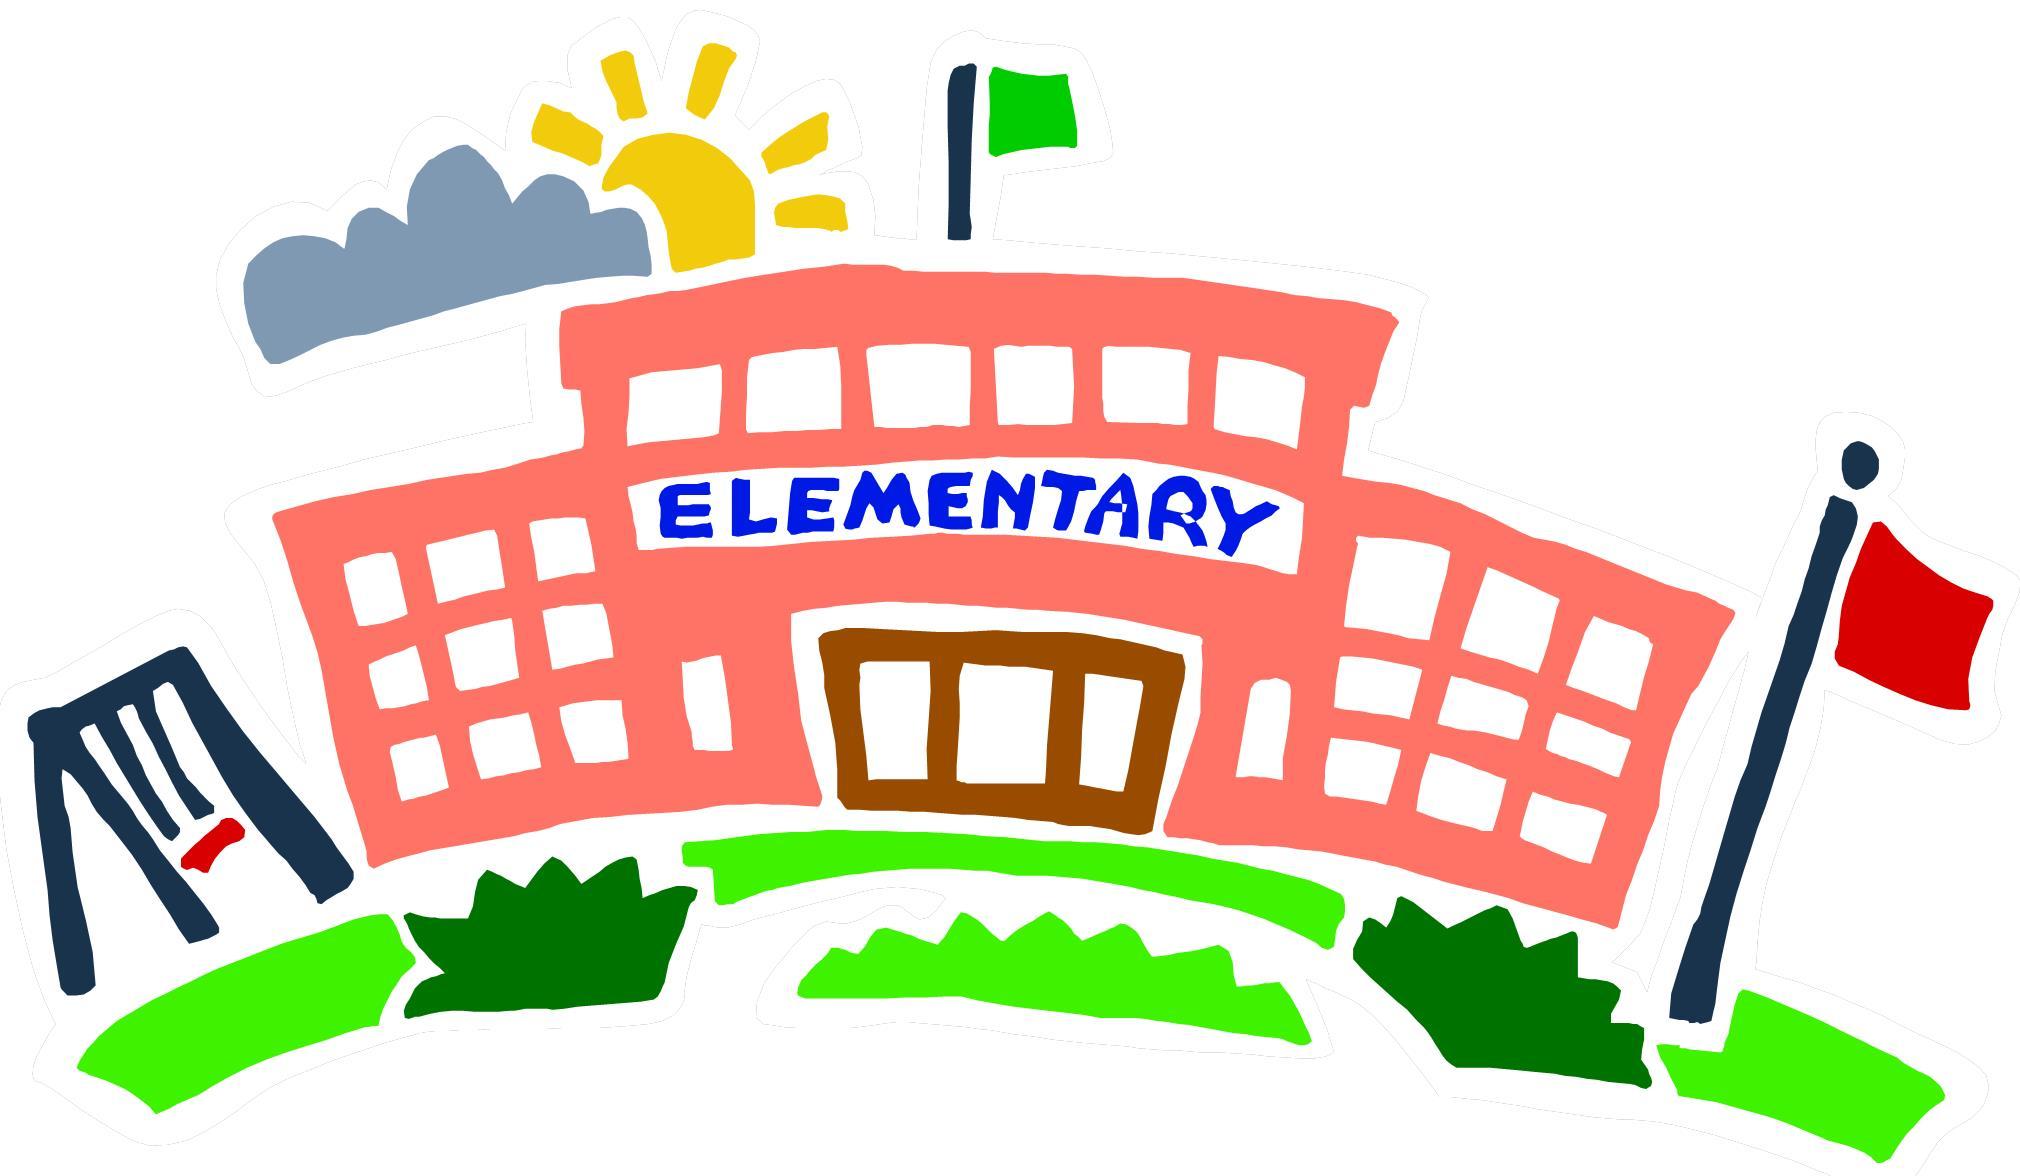 Free School Clip Art From - Vergilis Clipart; Elementary .